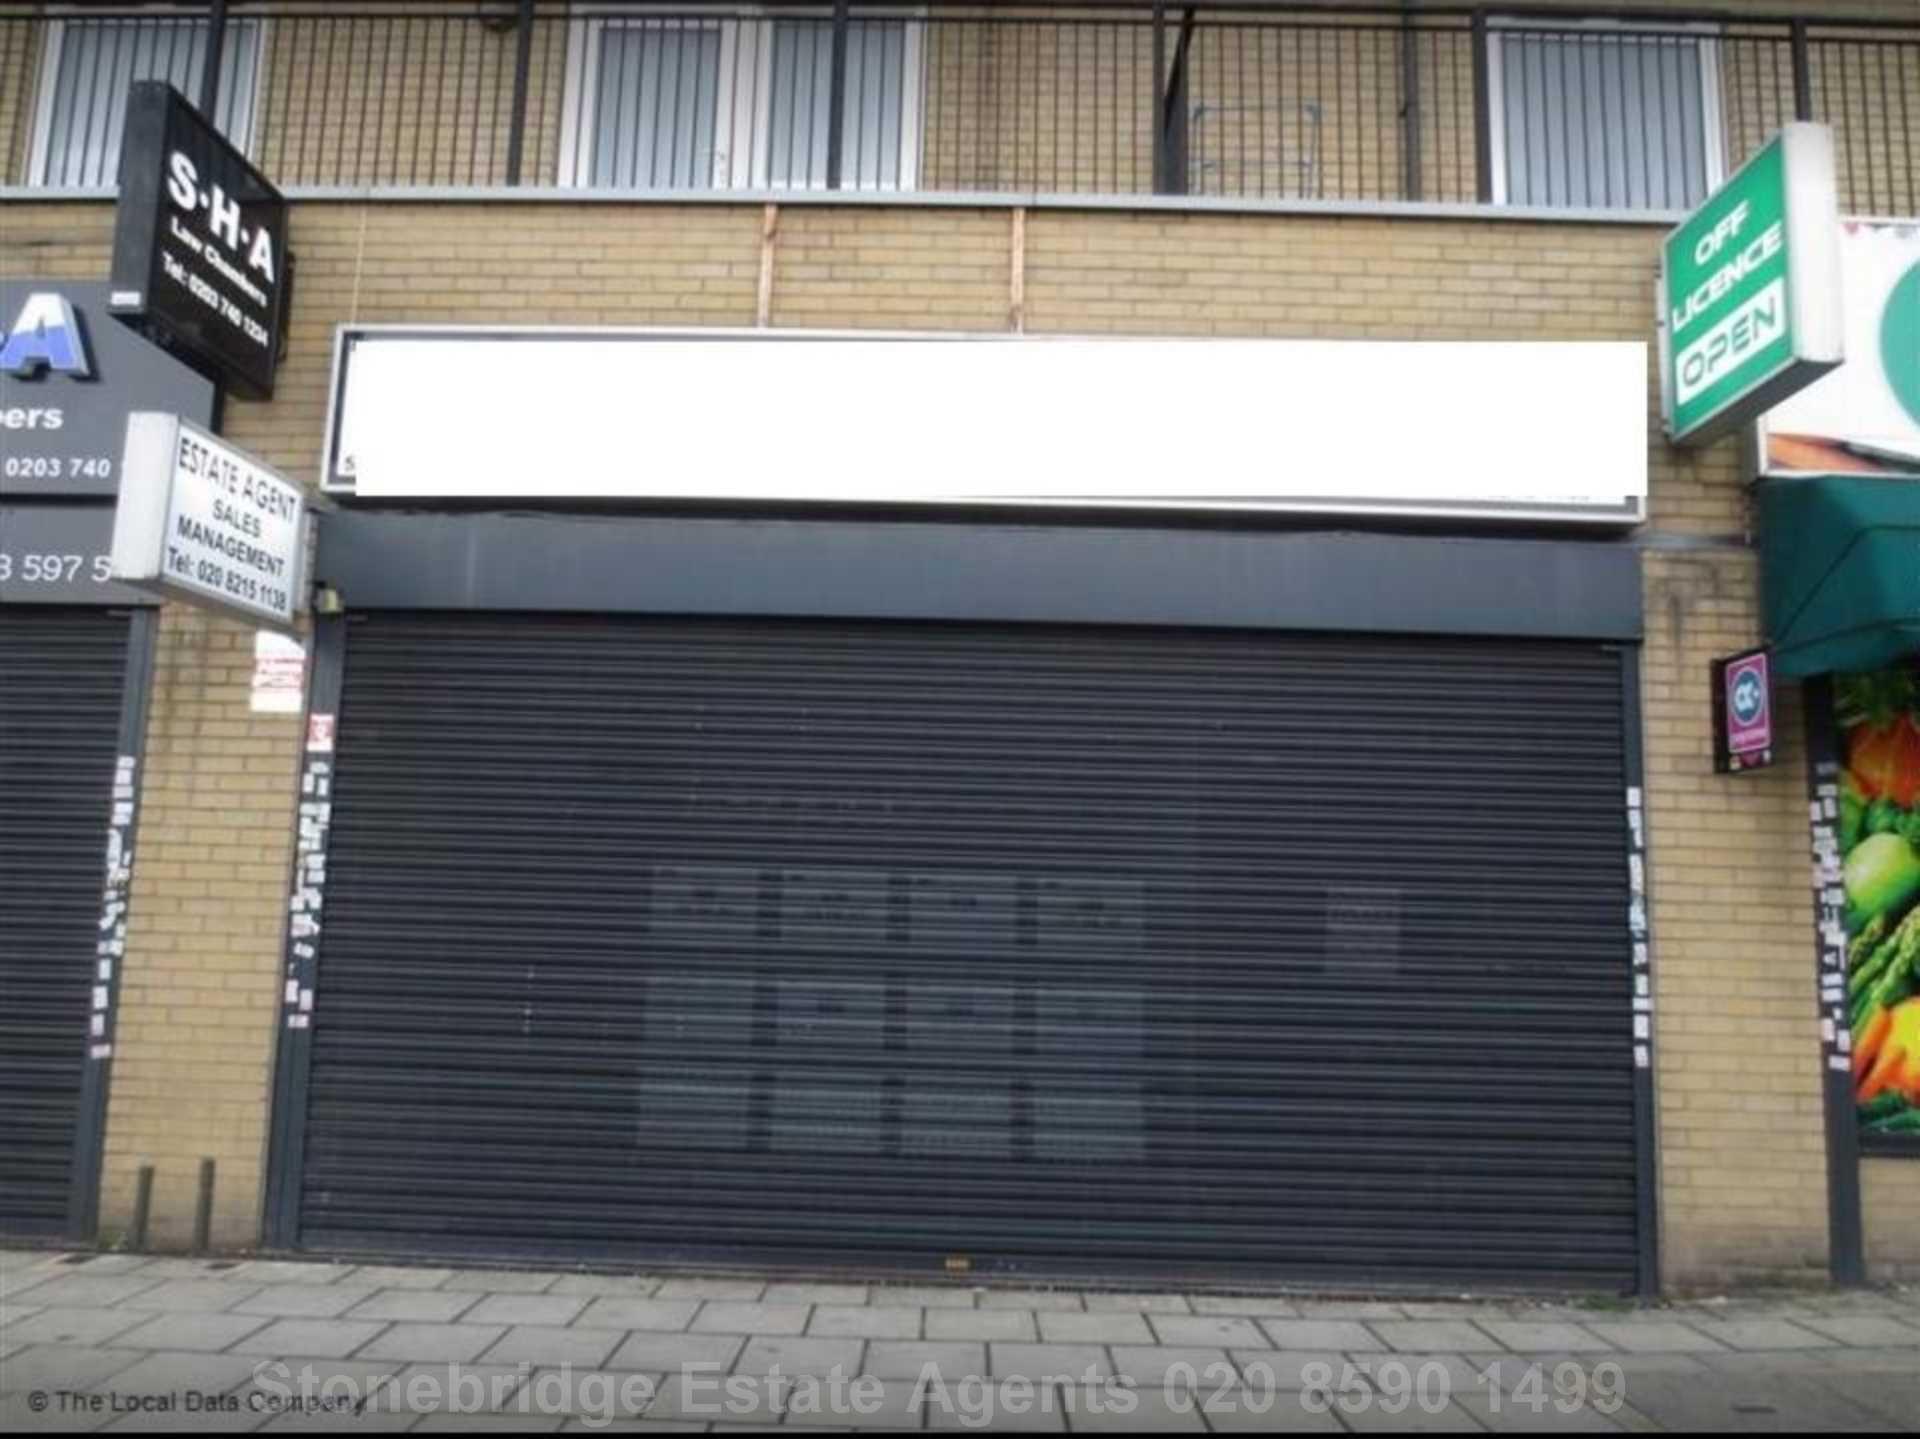 Green Lane, Seven Kings, IG3 9RH, Image 1